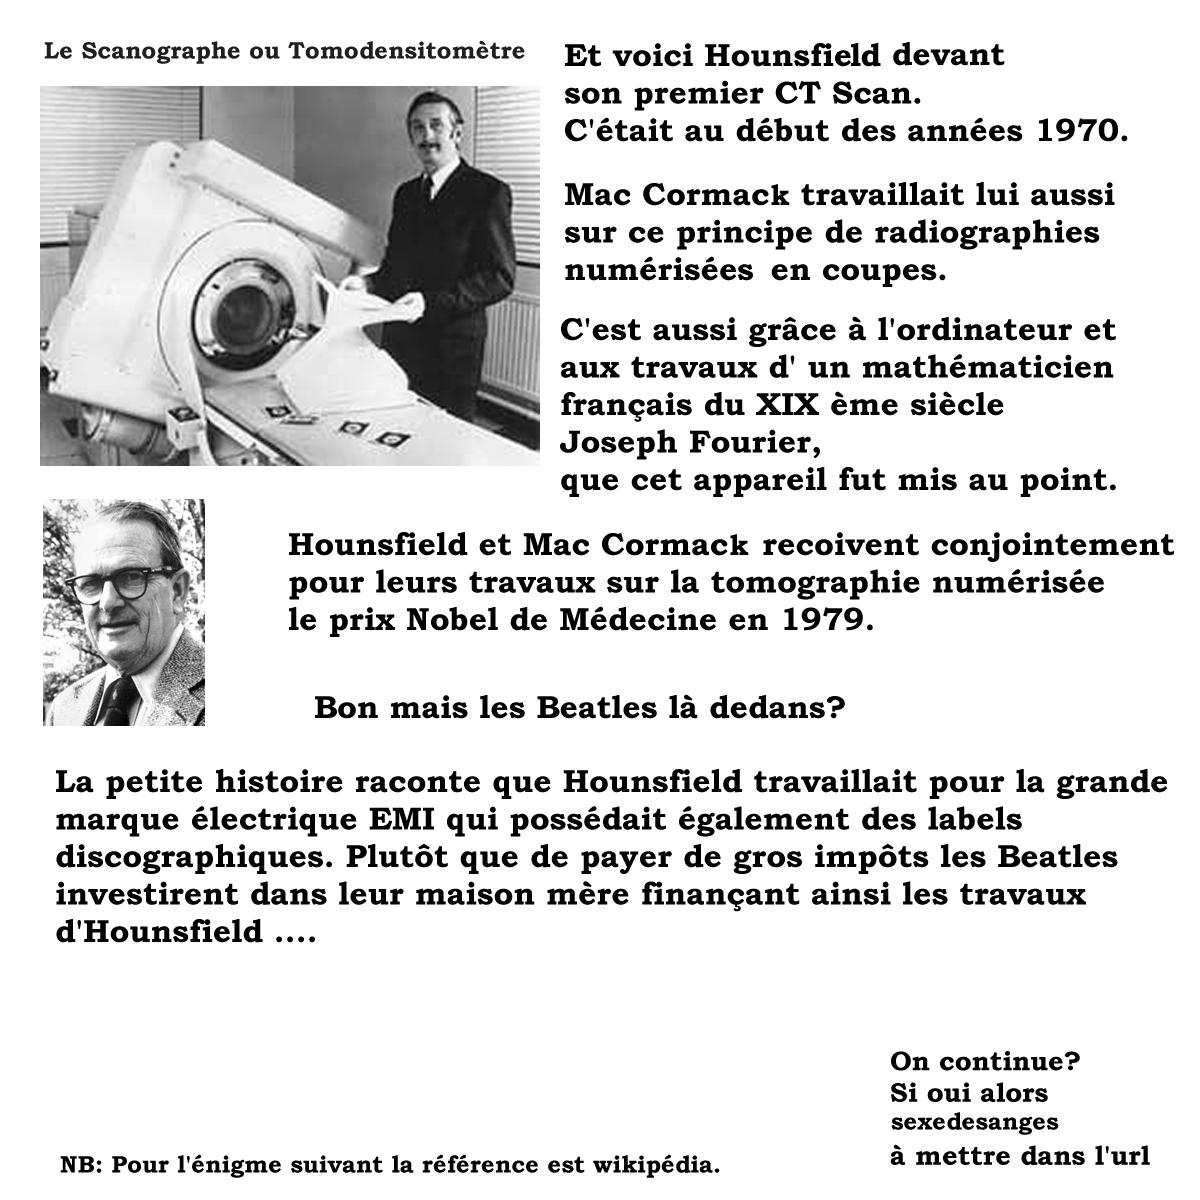 http://www.prise2tete.fr/upload/papyricko-maccormackhounsfield.jpg